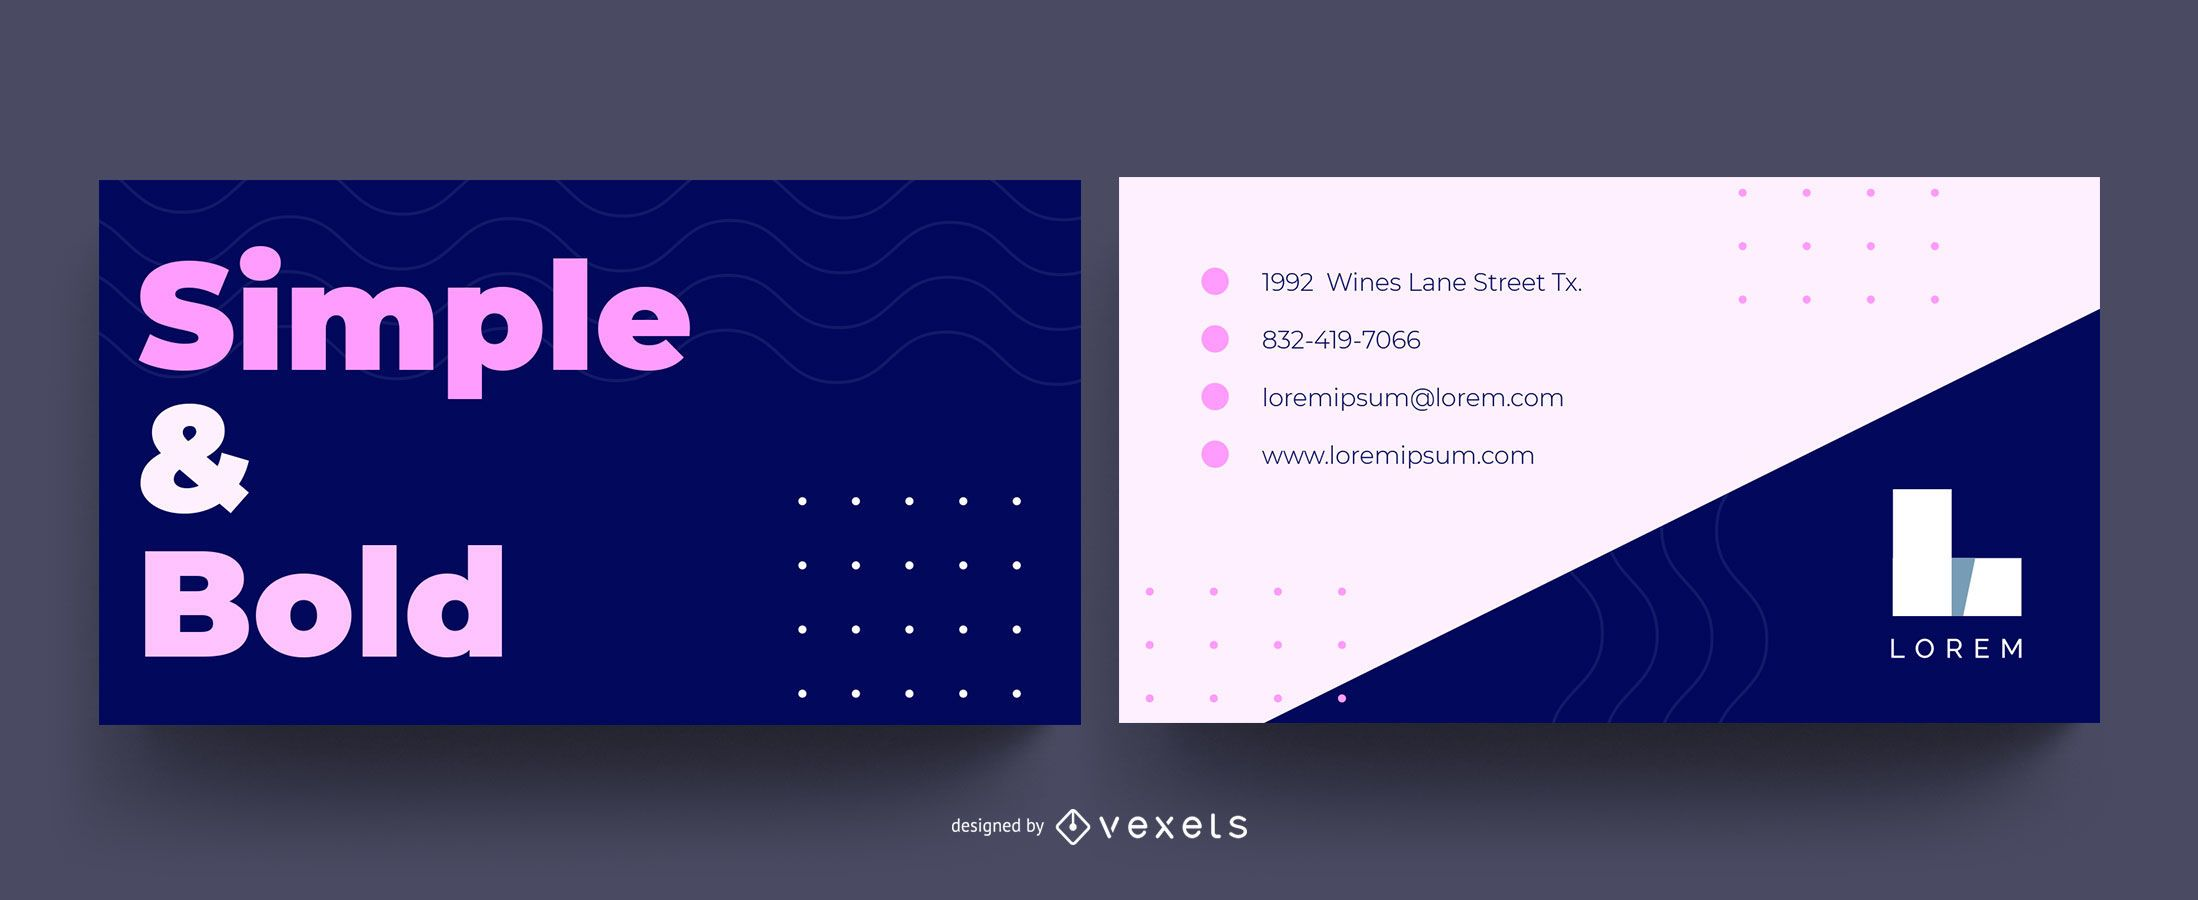 Simple Bold Business Card Design